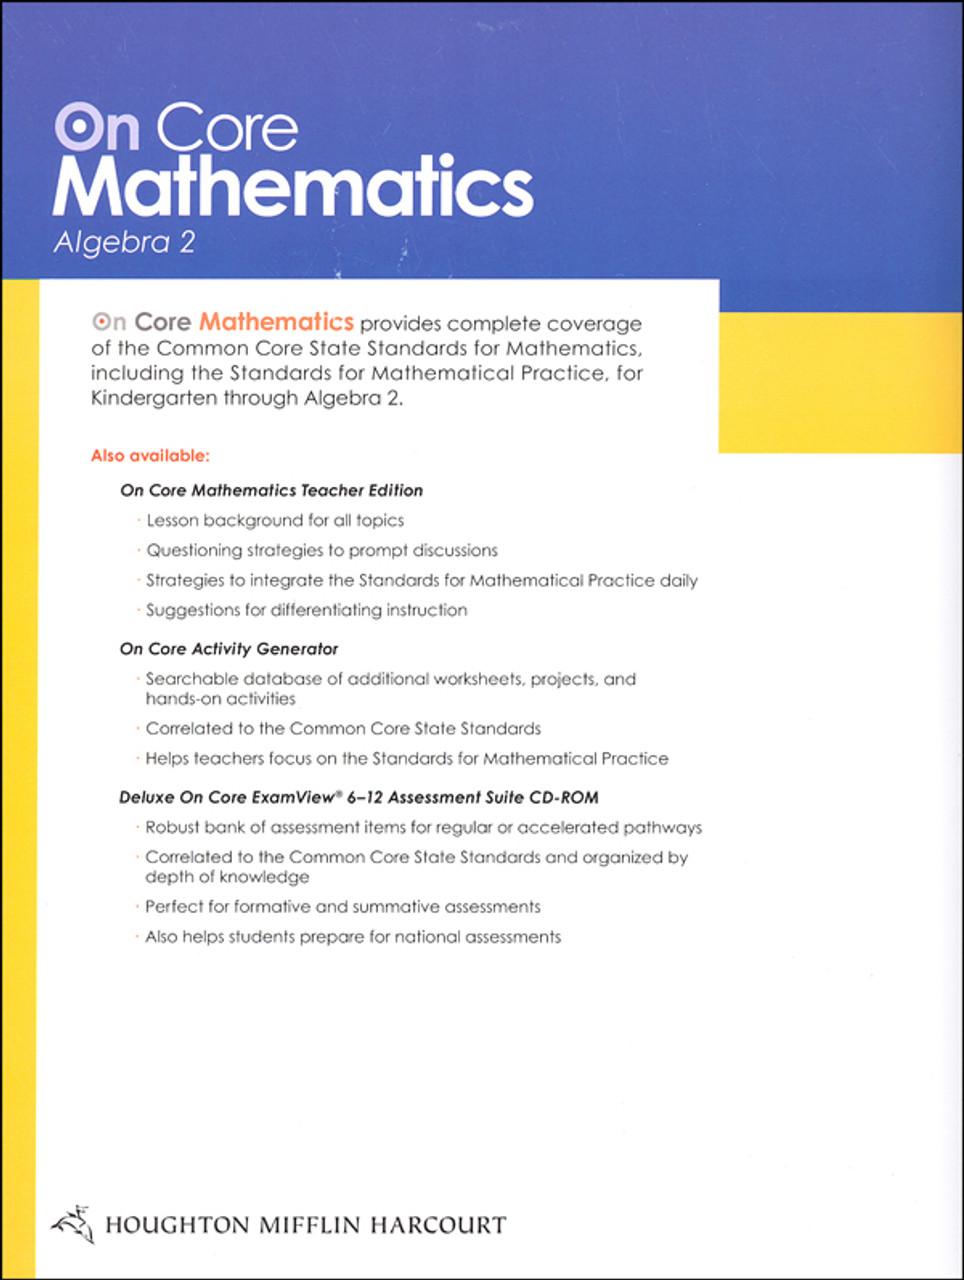 small resolution of On Core Math - Houghton Mifflin Harcourt - Grade 9-12 Algebra 2 Student  Worktext - Classroom Resource Center